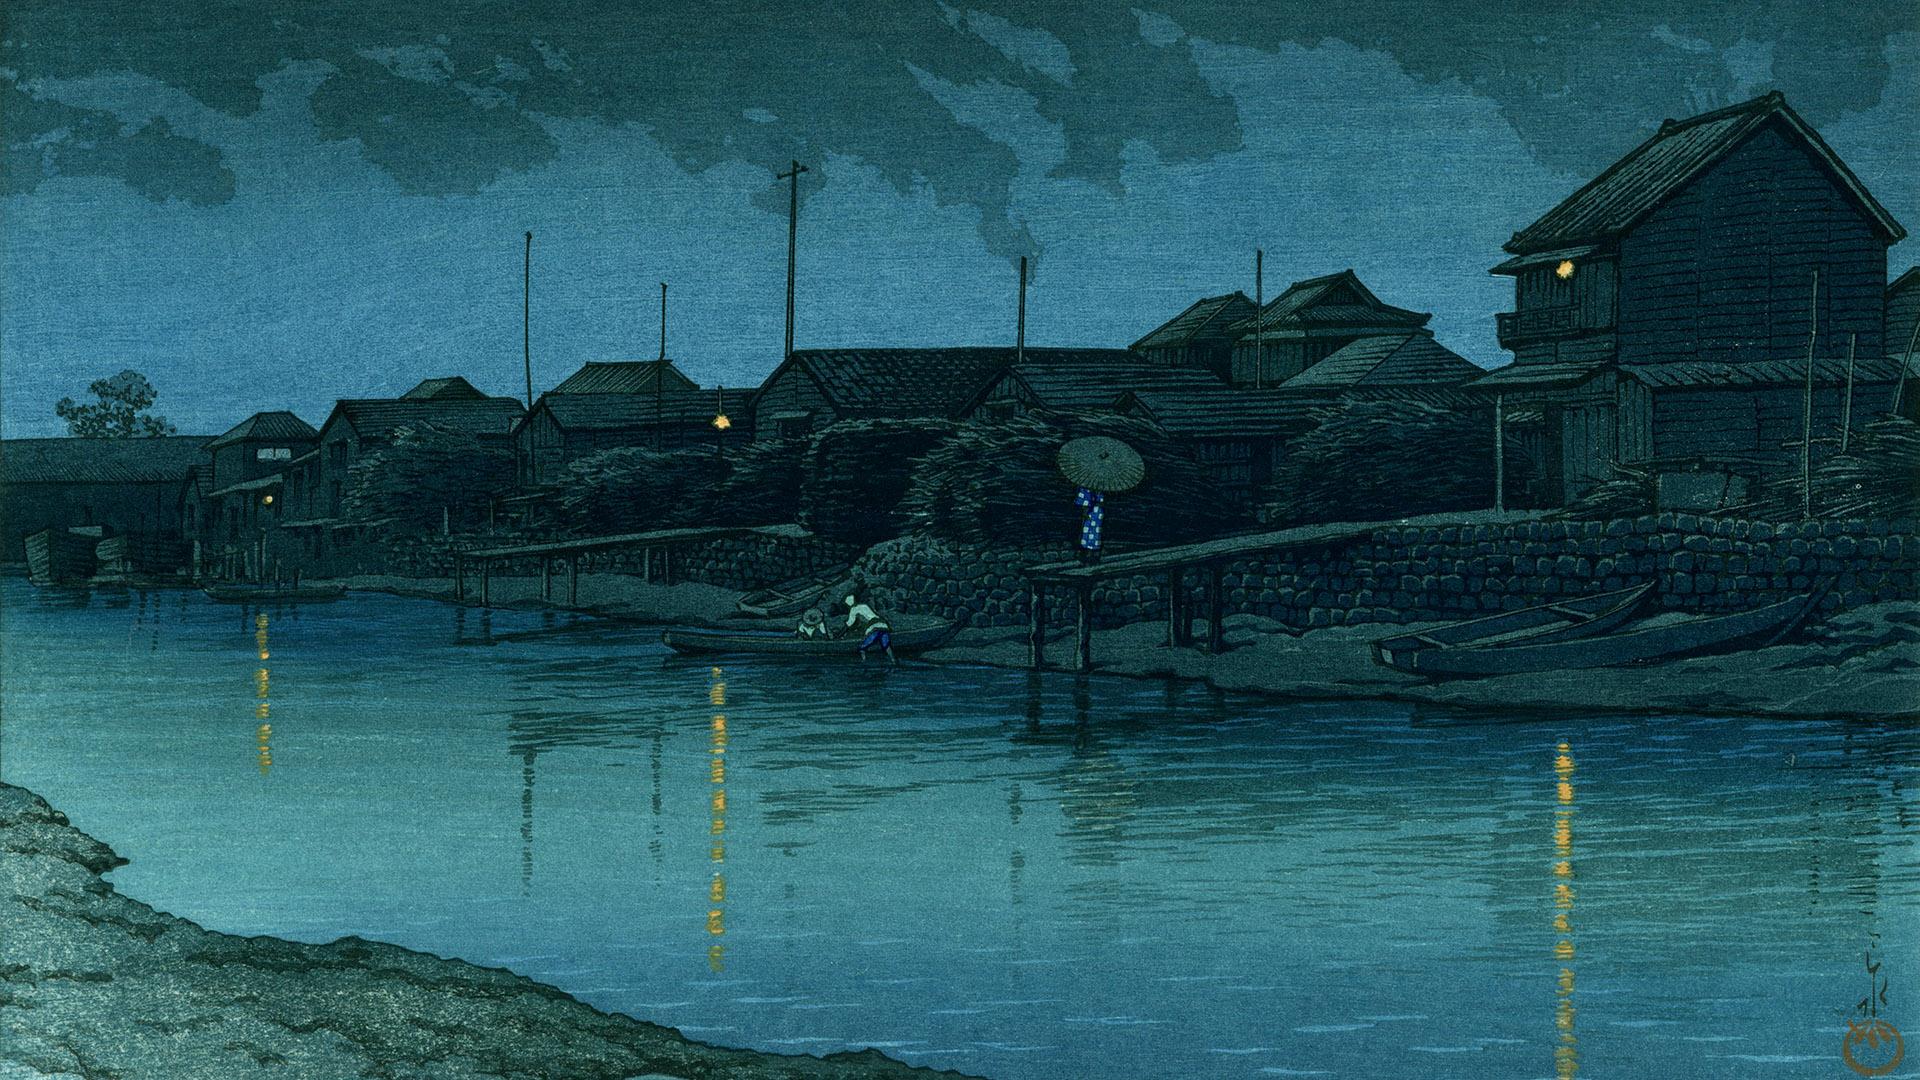 川瀬巴水 大森海岸 Kawase Hasui - Tokyo 20 kei omori kaigan 1920x1080